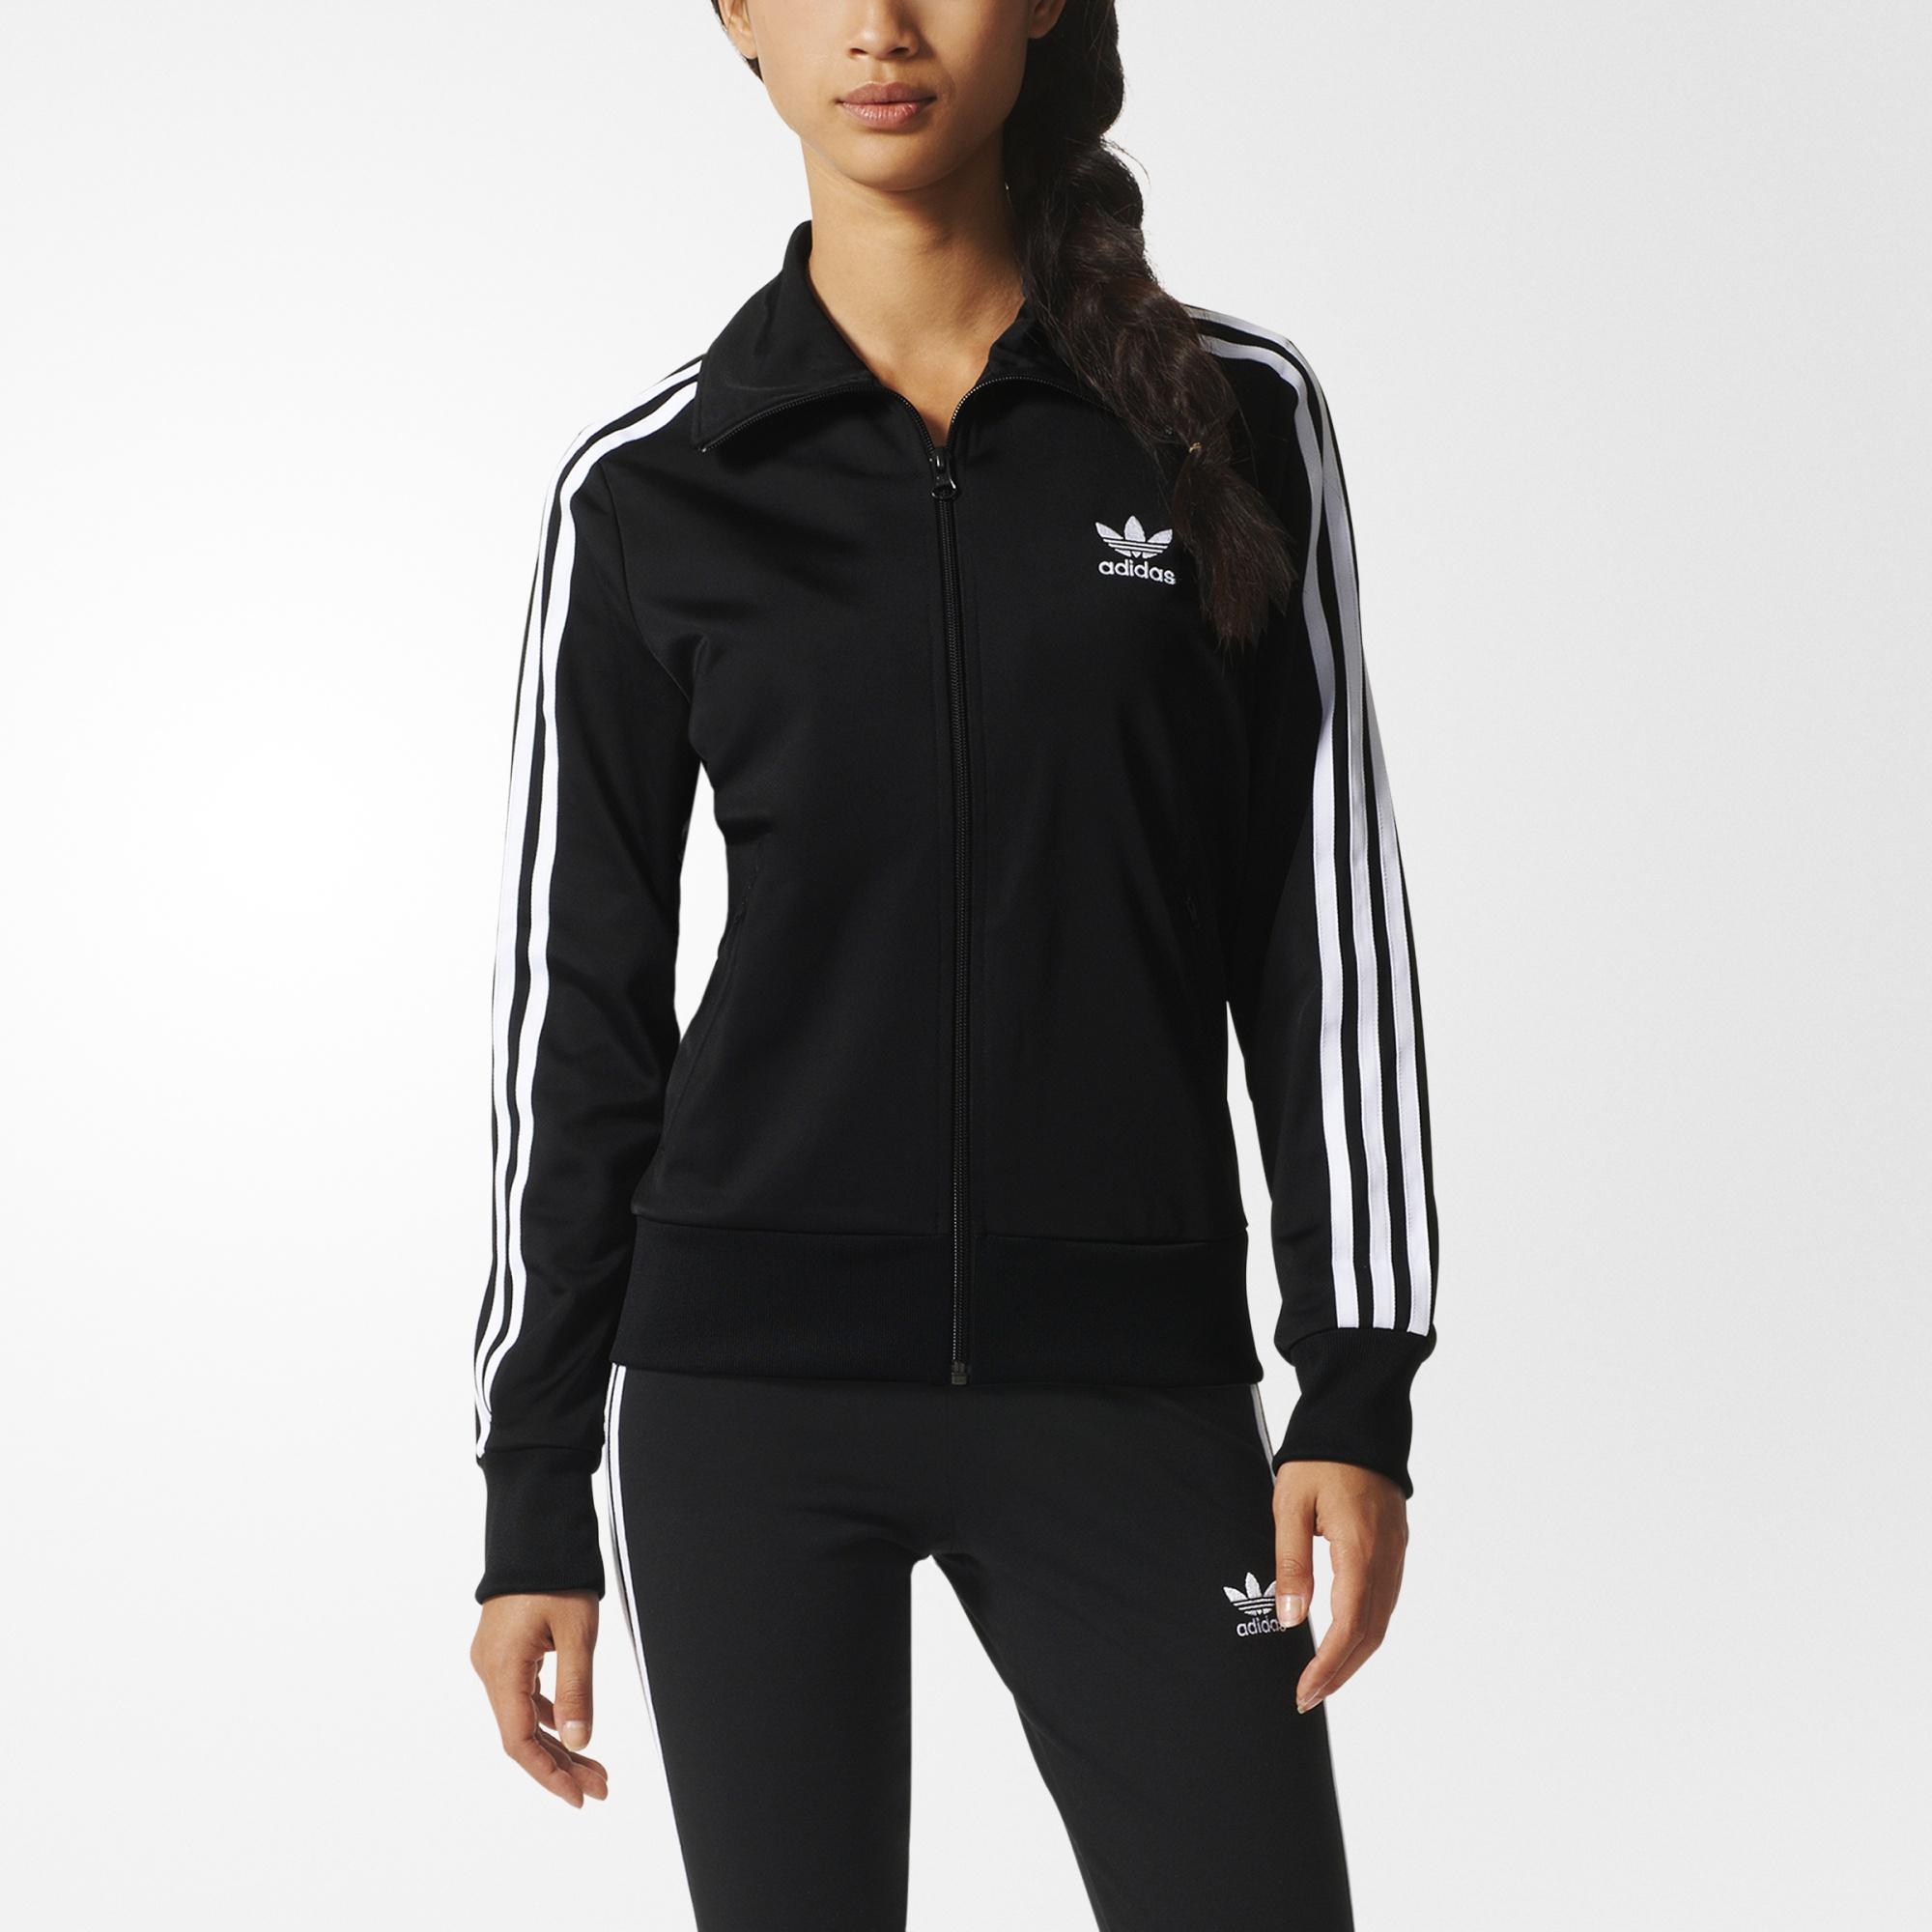 adidas zip jacket